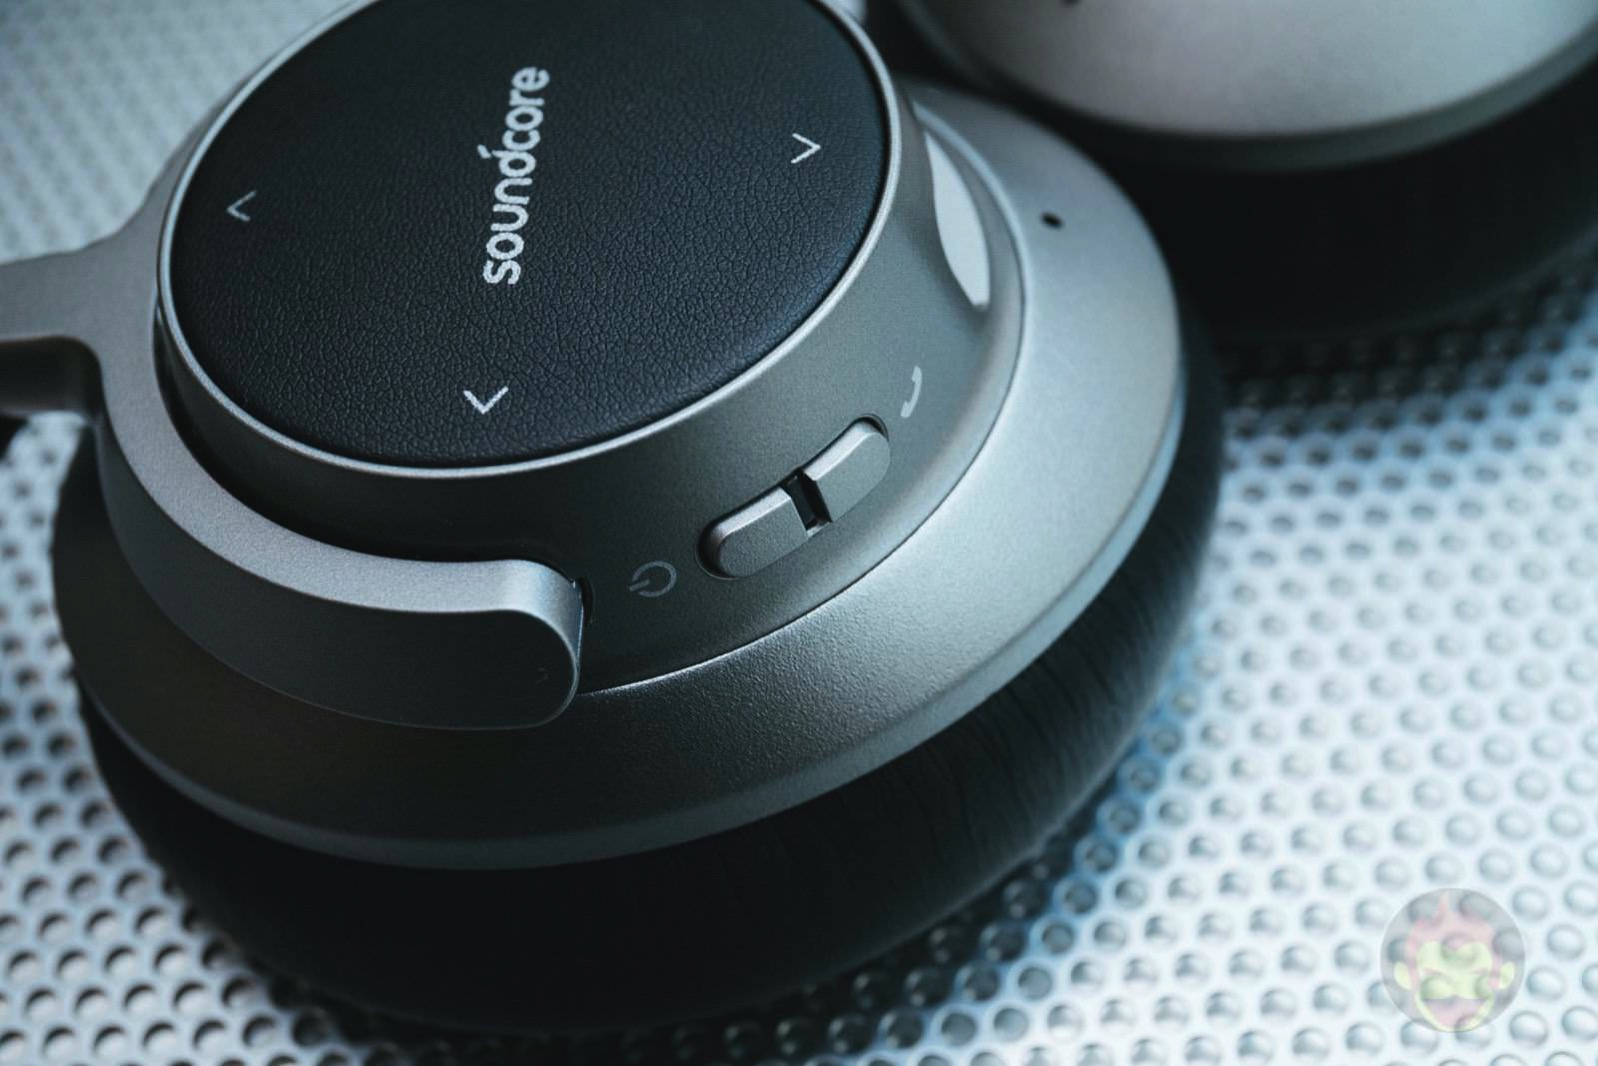 Soundcore-Space-NC-Wireless-Headphones-09.jpg